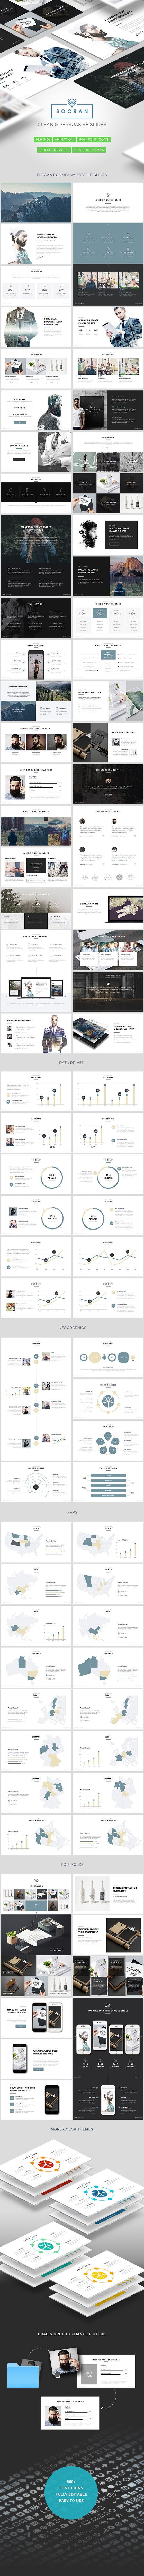 SOCRAN - Clean & Modern Keynote Template - Keynote Templates Presentation Templates